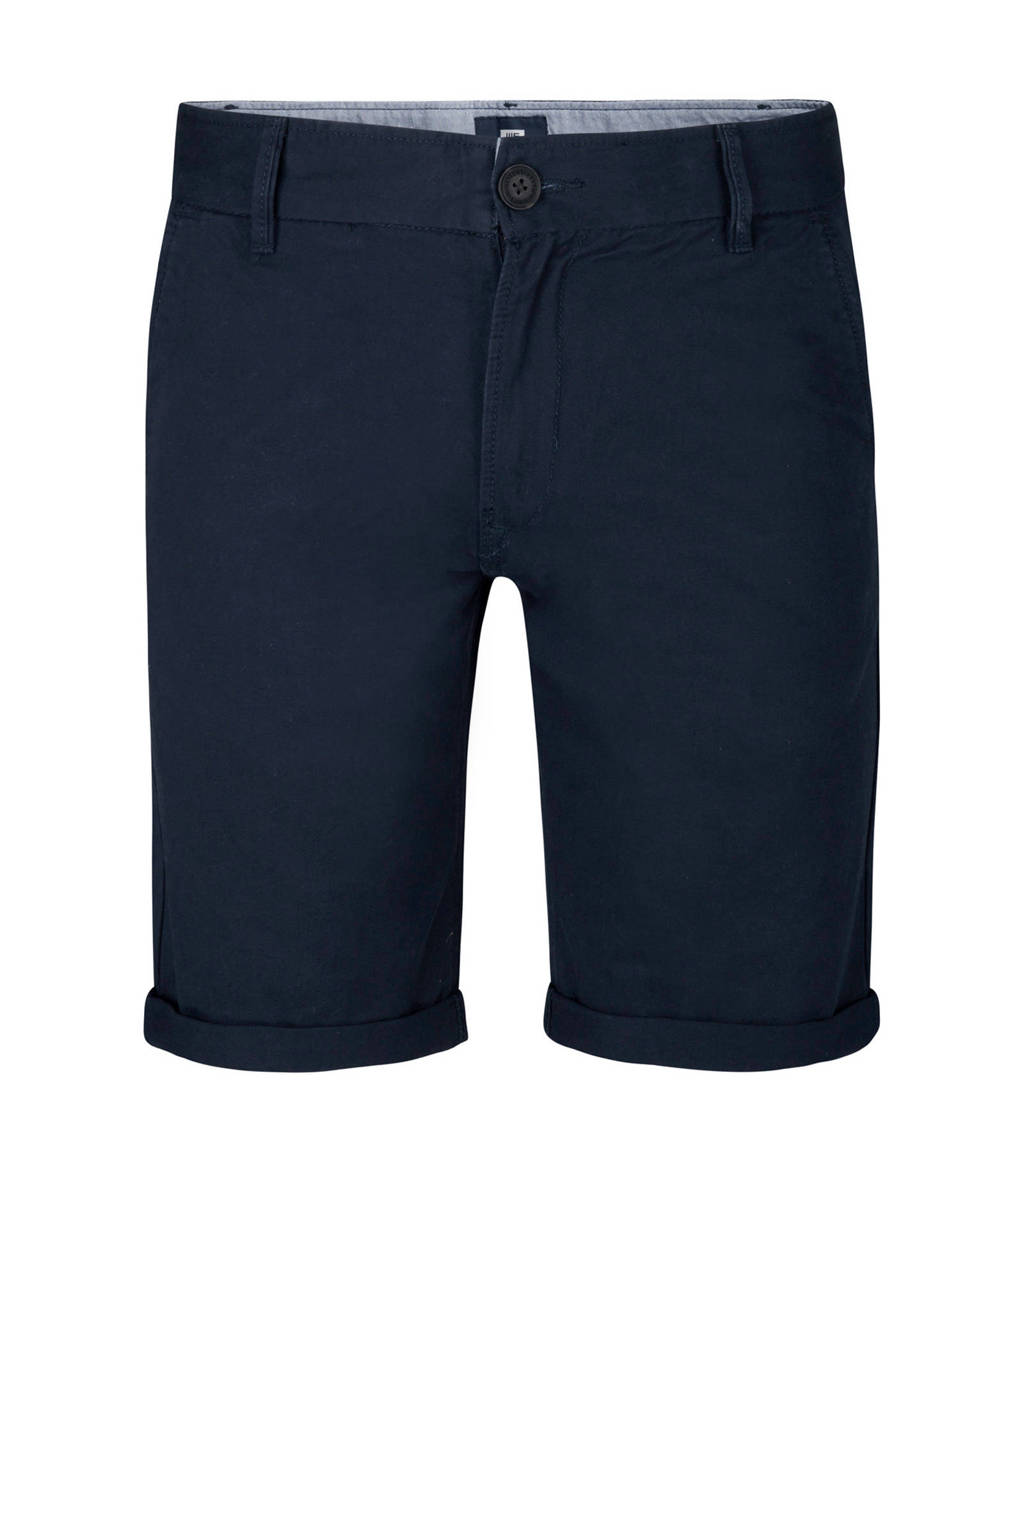 WE Fashion bermuda, Royal Navy